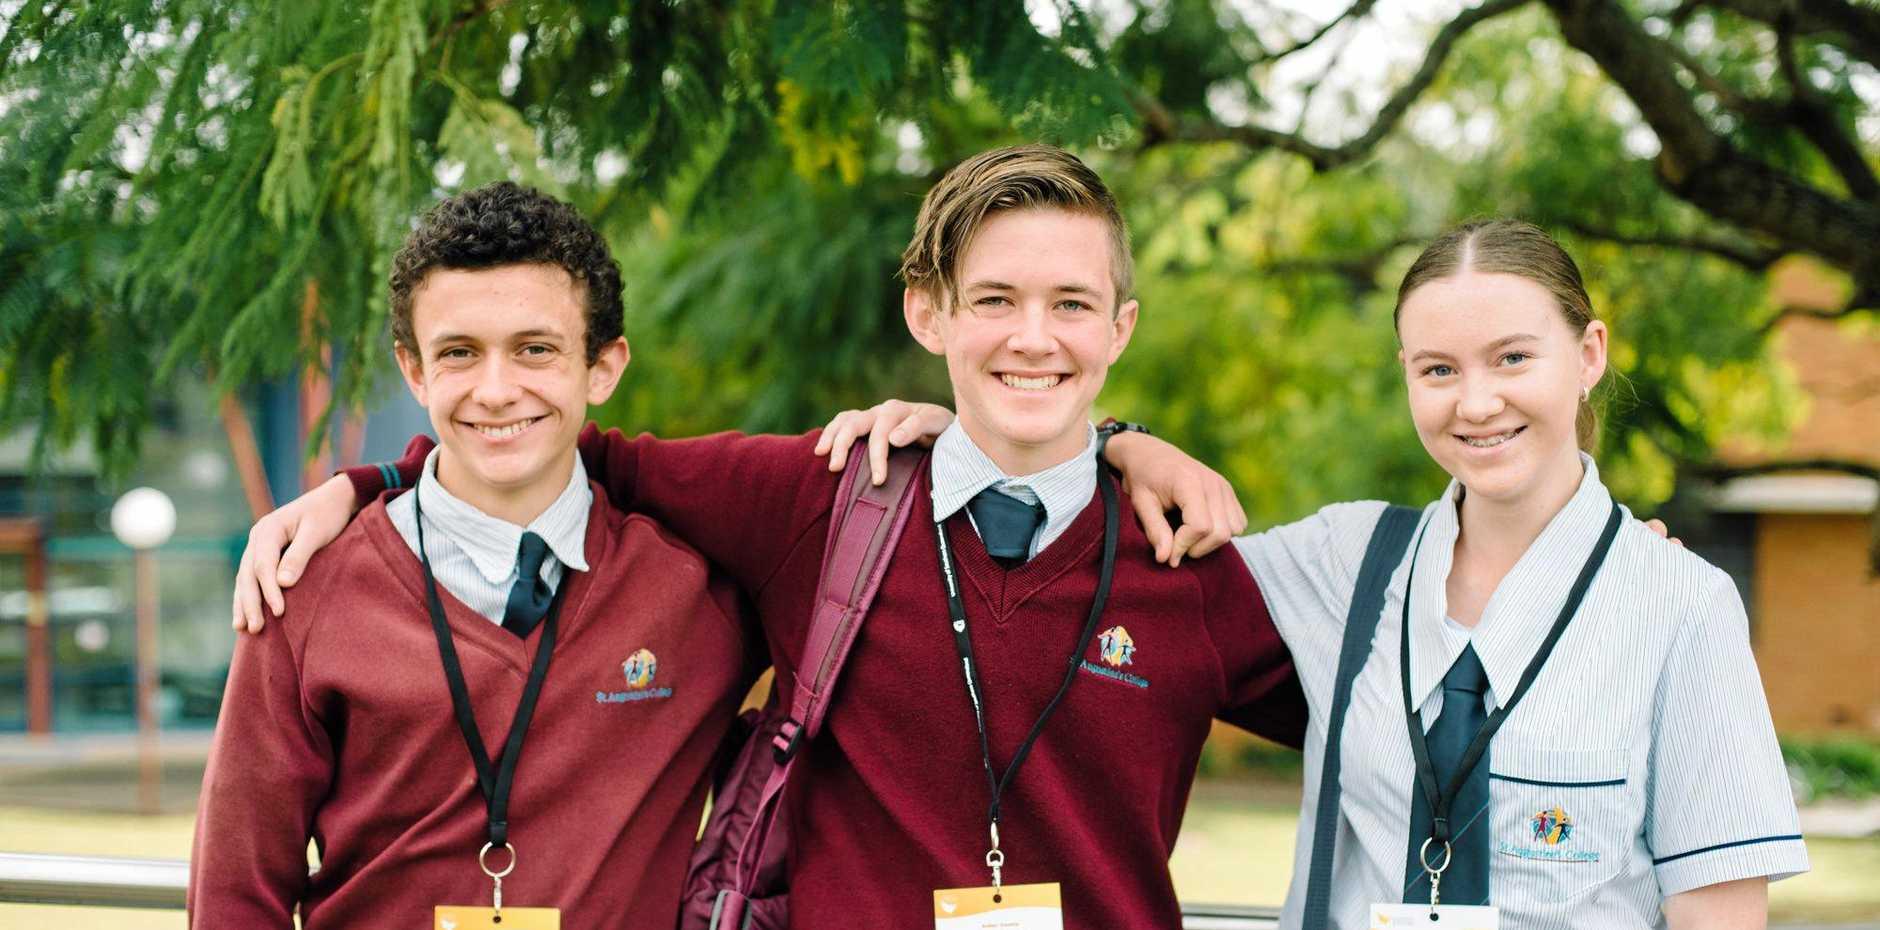 St Augustine's College students Seth Gulielmin, Aidan Gossip and Madeline Higgins.